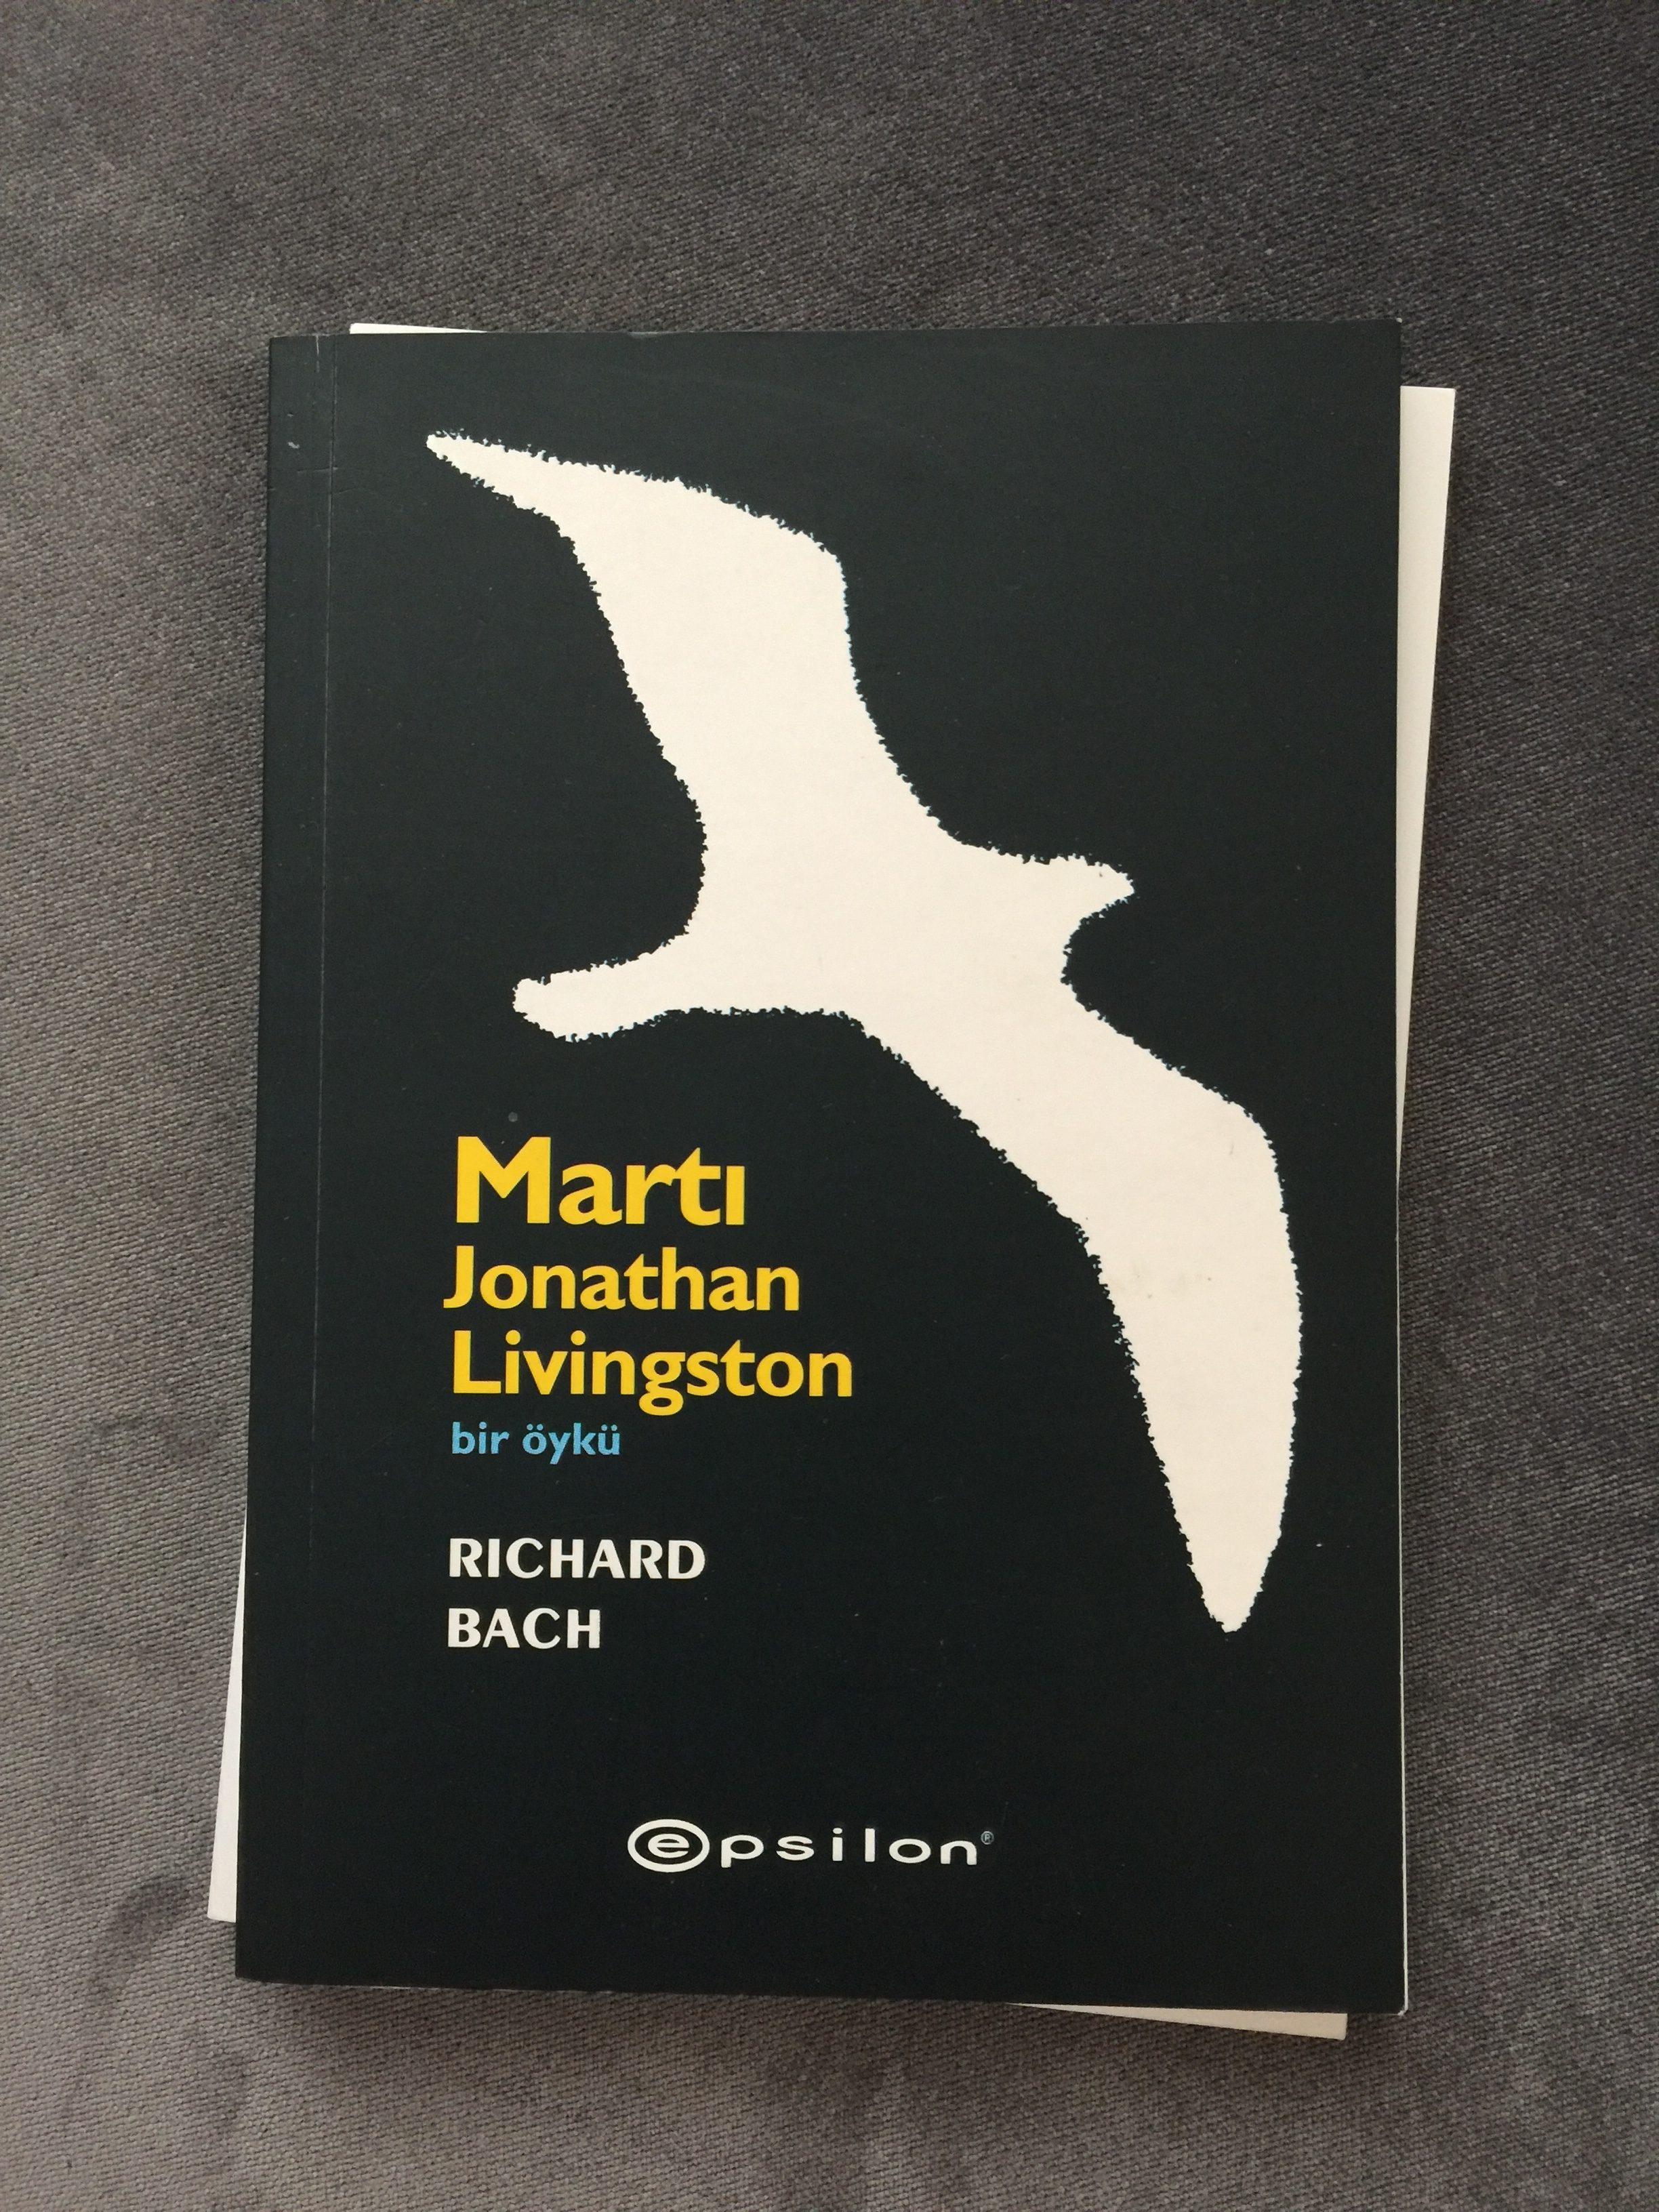 8eeefd6504d7 Martı Jonathan Livingston – Op. Dr. Banu Çiftçi